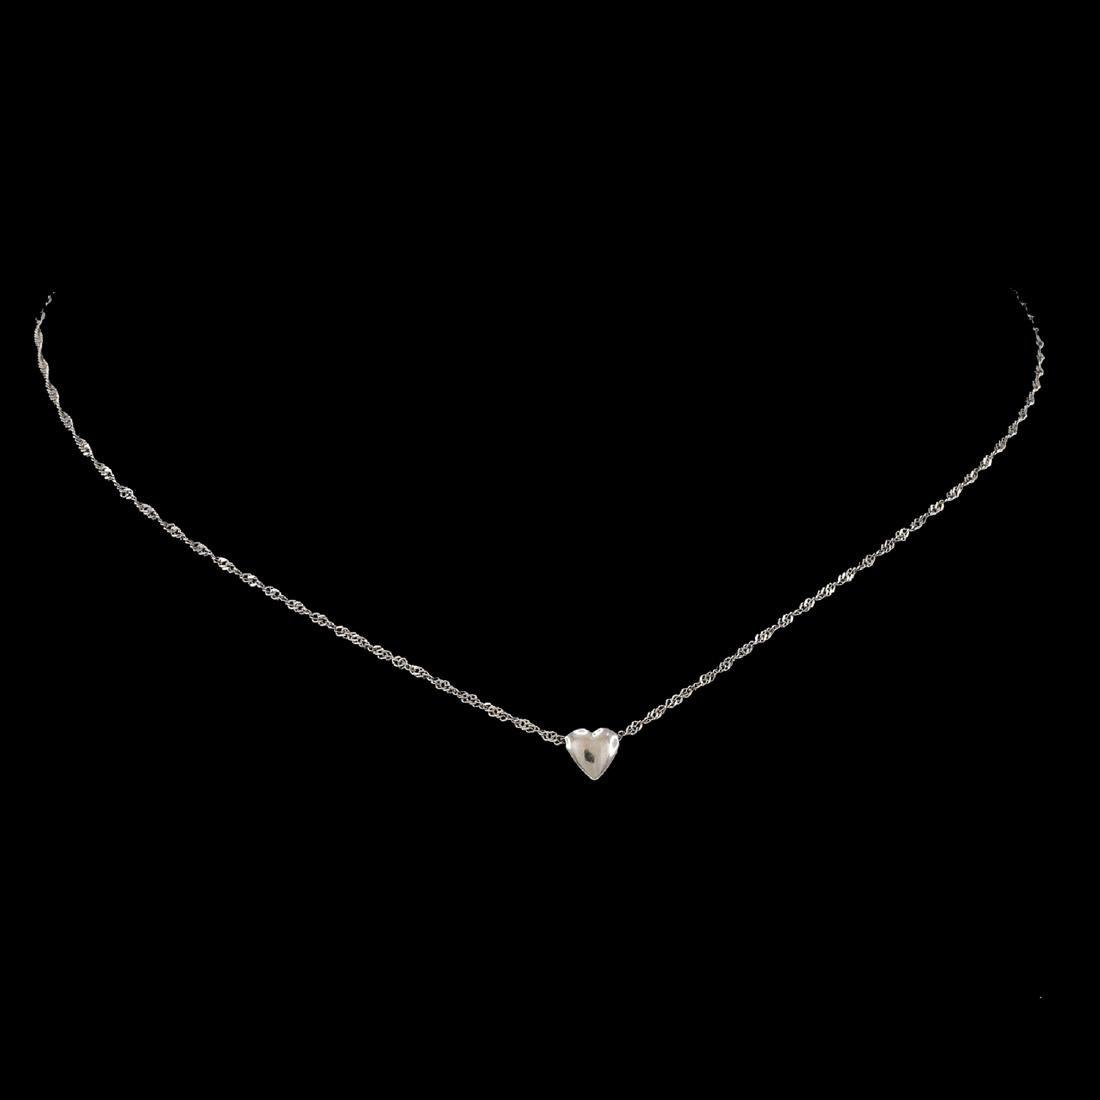 *Fine Jewelry 14KT White Gold Singapore W Puffed Heart